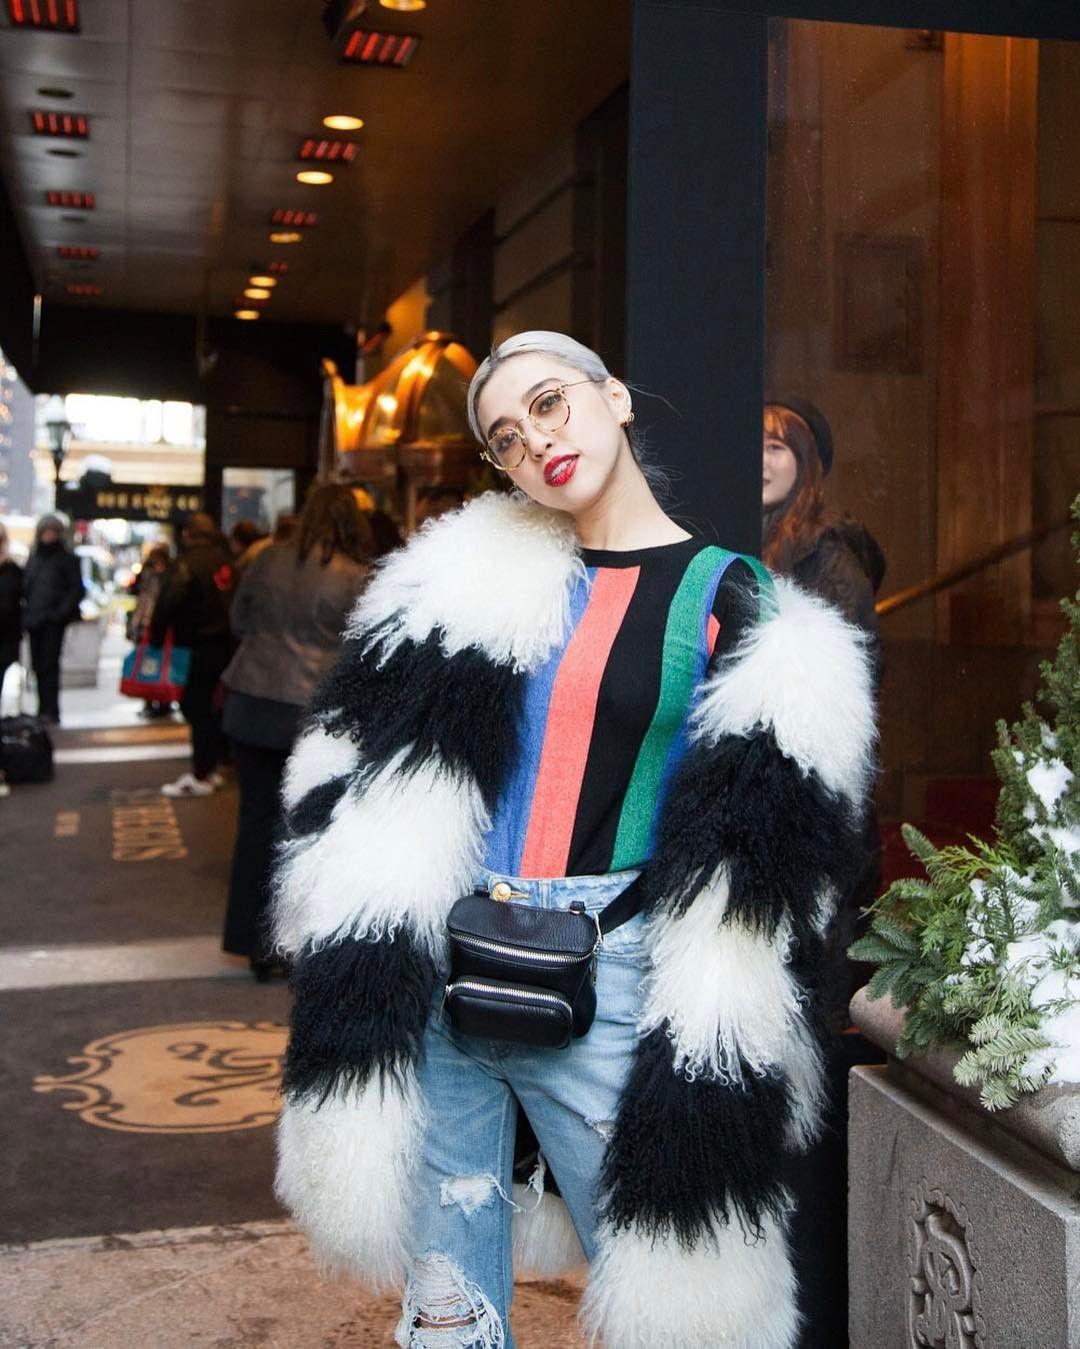 "4,158 Likes, 14 Comments - Alisa Ueno/植野有砂 (@alisaueno) on Instagram: ""#NYC 🗽🍎❤🚕🏙 @aocfashion jacket // @figandviper knit and denim // @murua_official belt bag // hair…"""